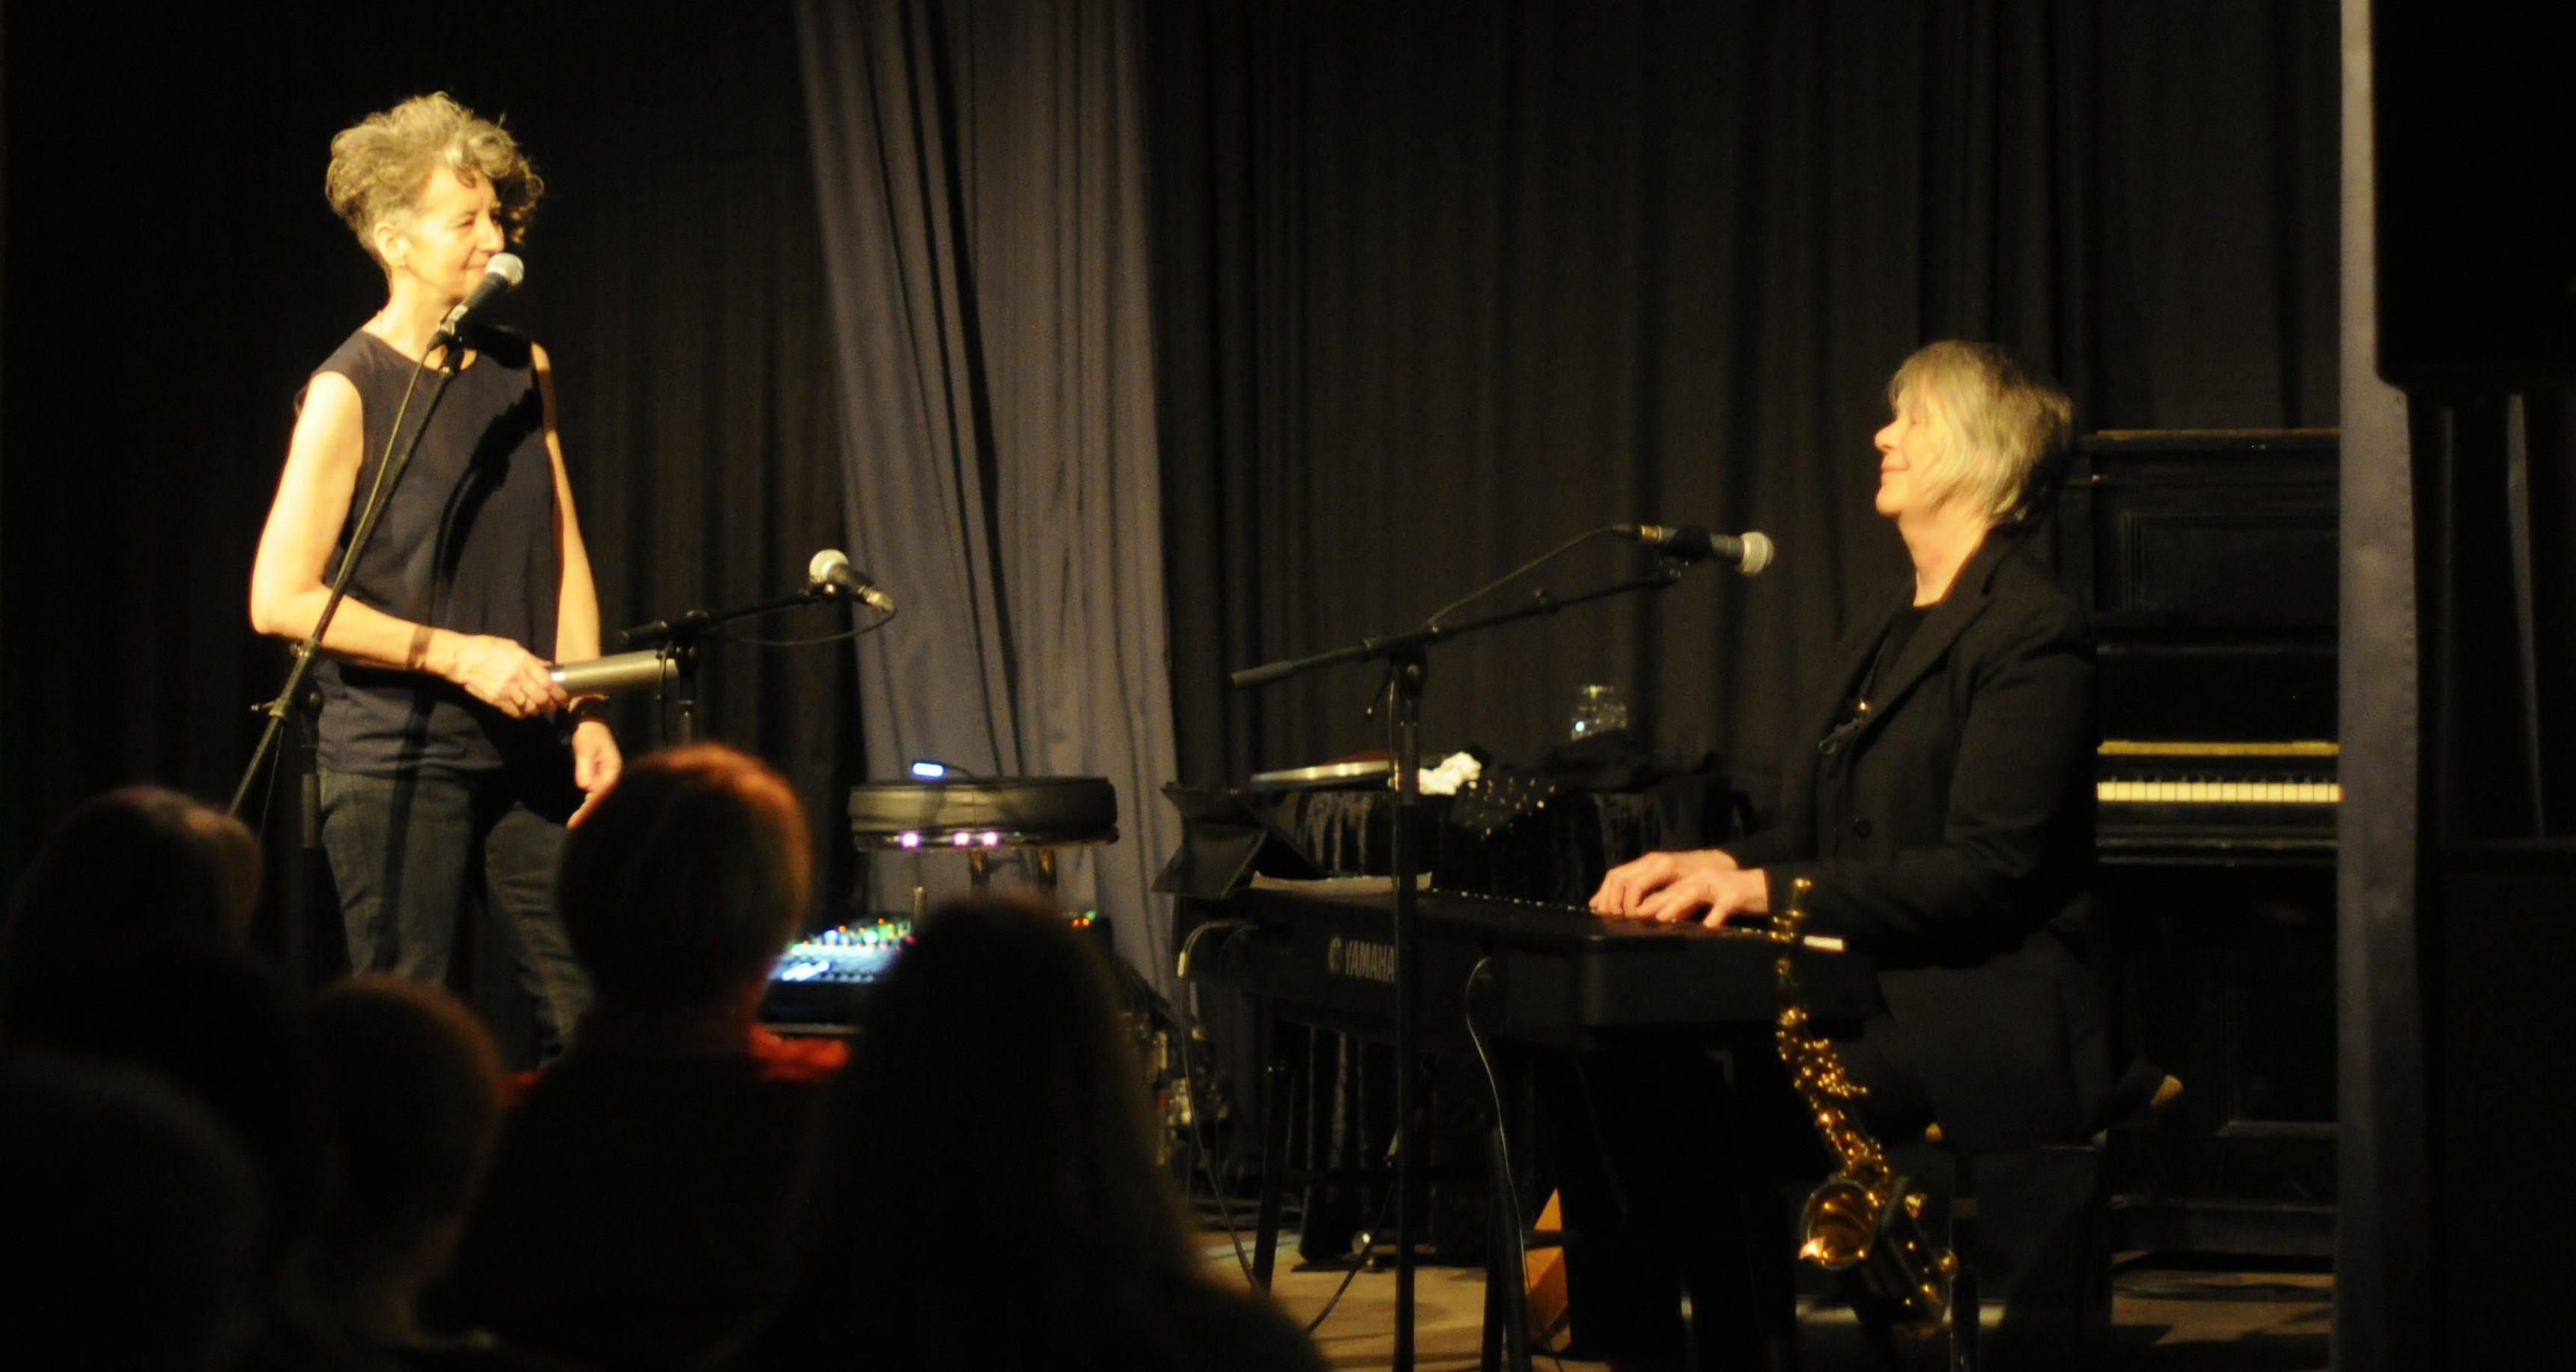 Maria Walsh und Carole Nelson in Darmstadt. Foto: Mira Lingmann